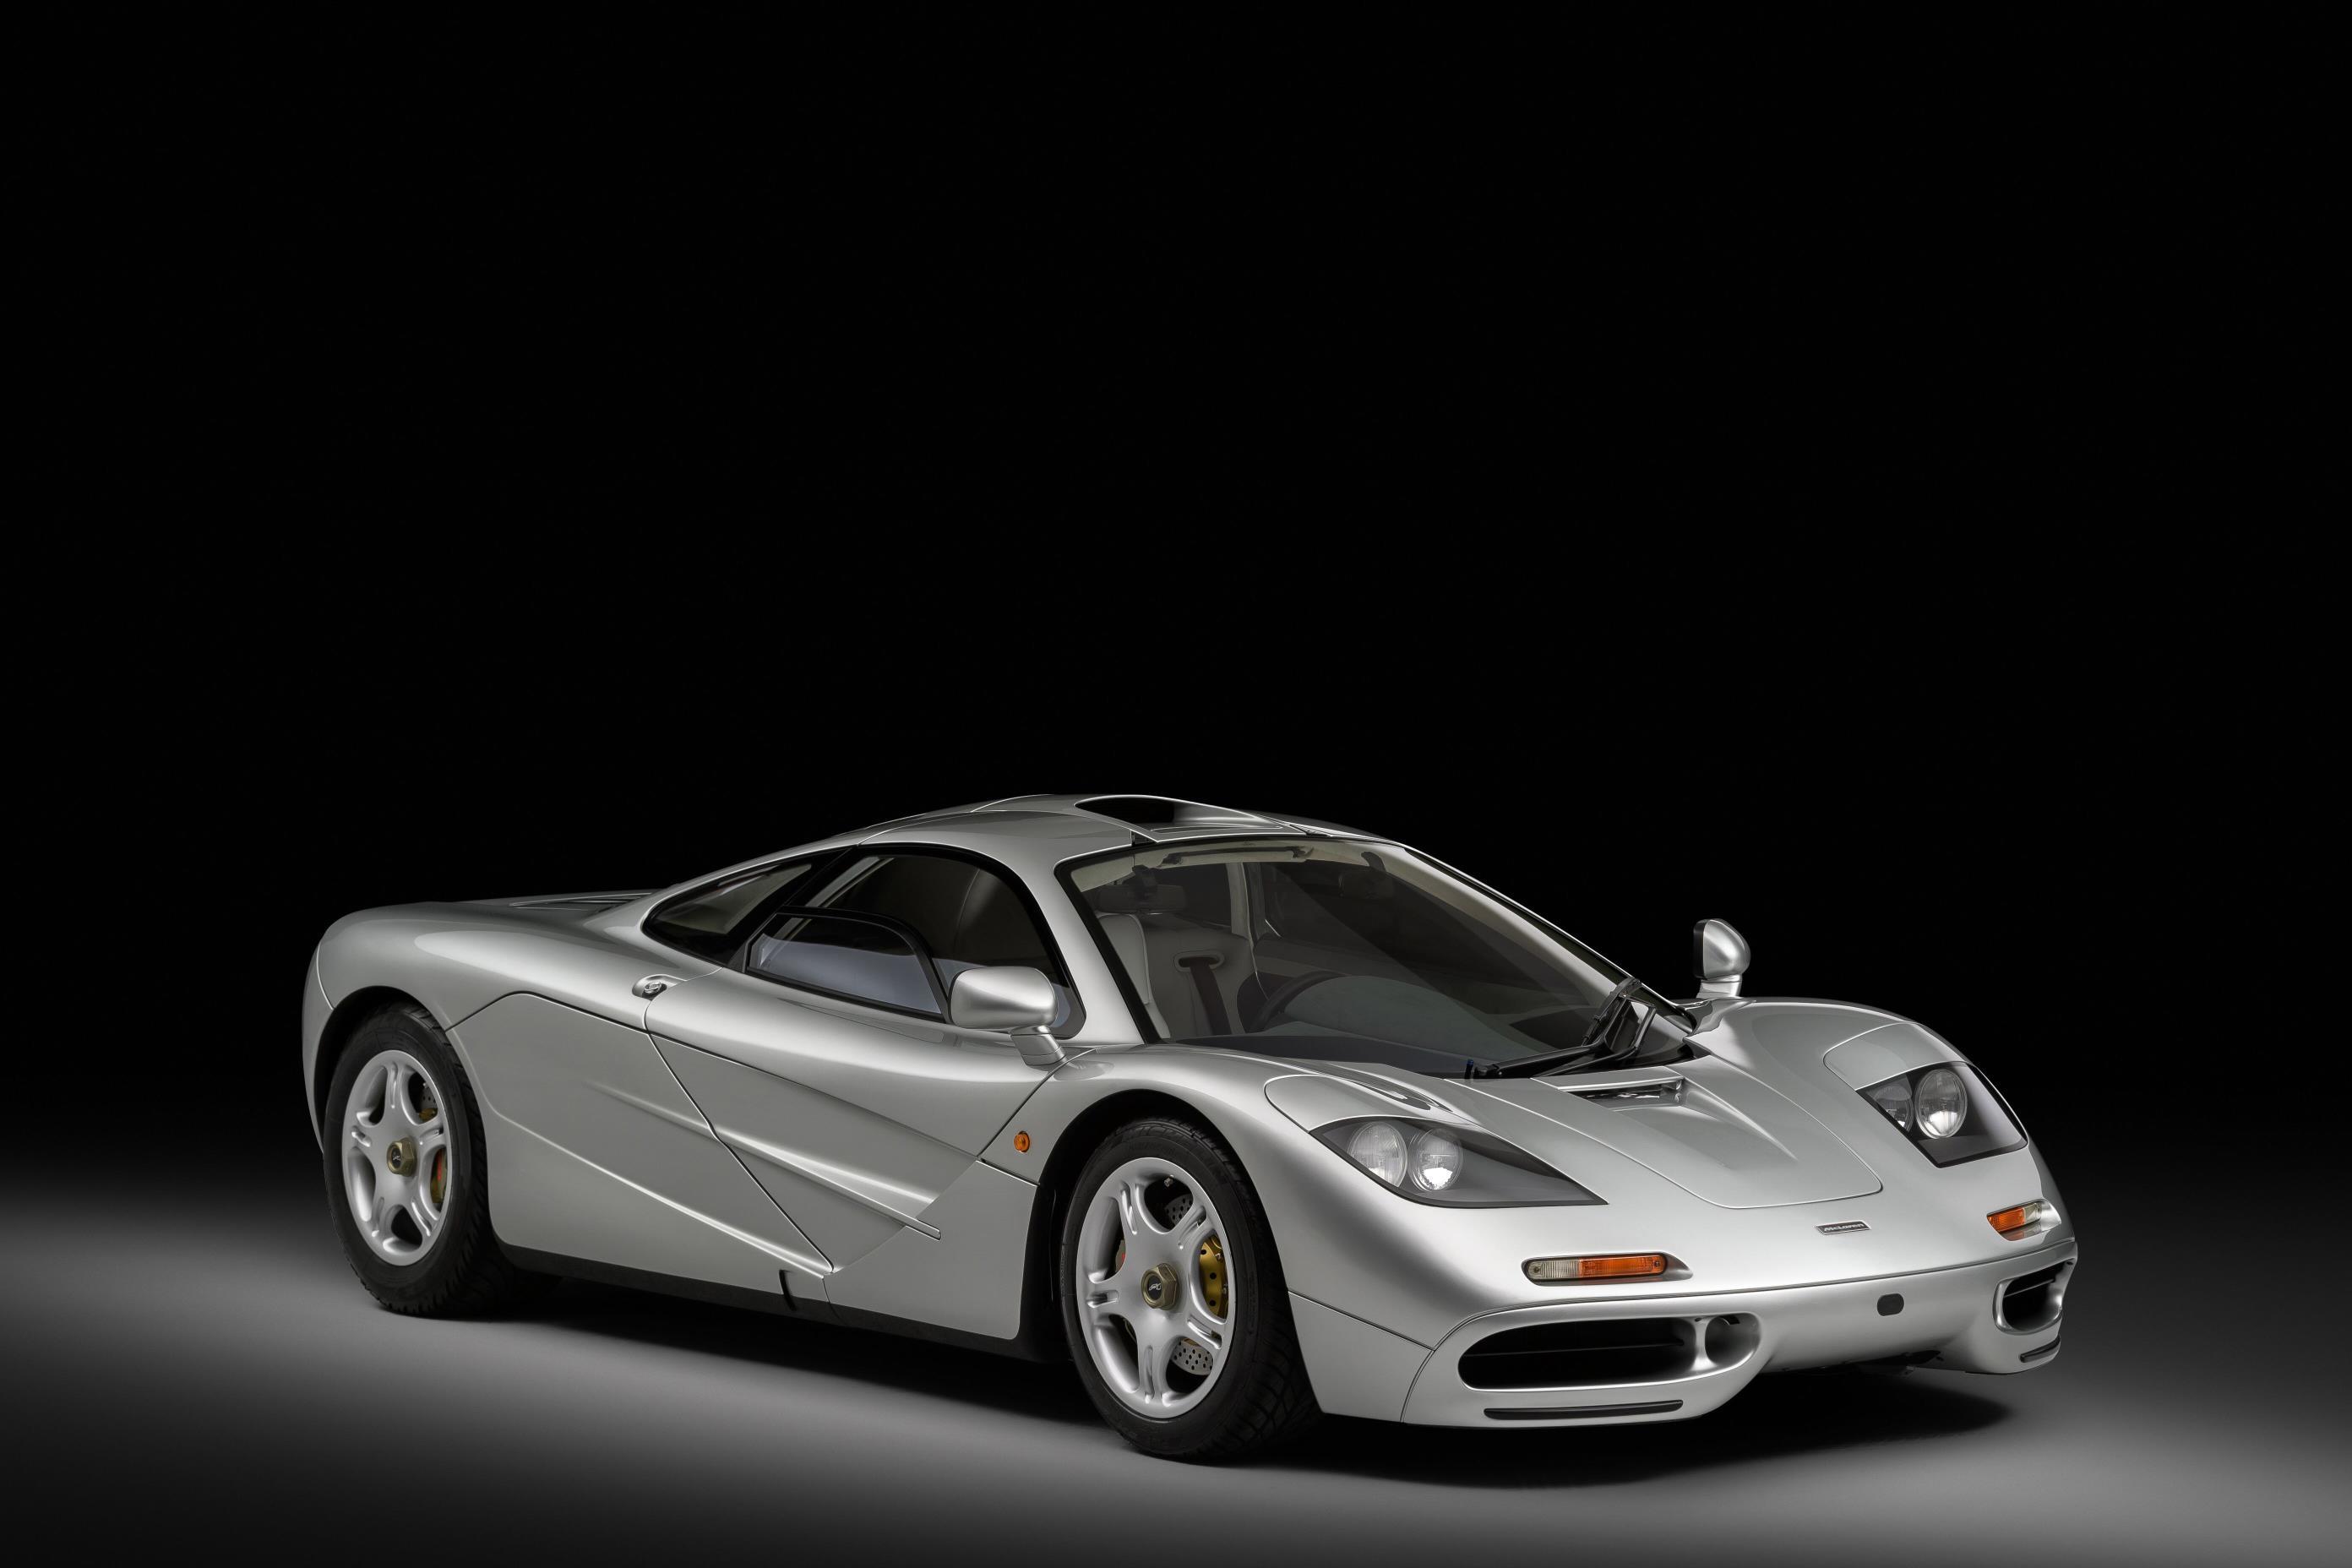 Silver McLaren F1